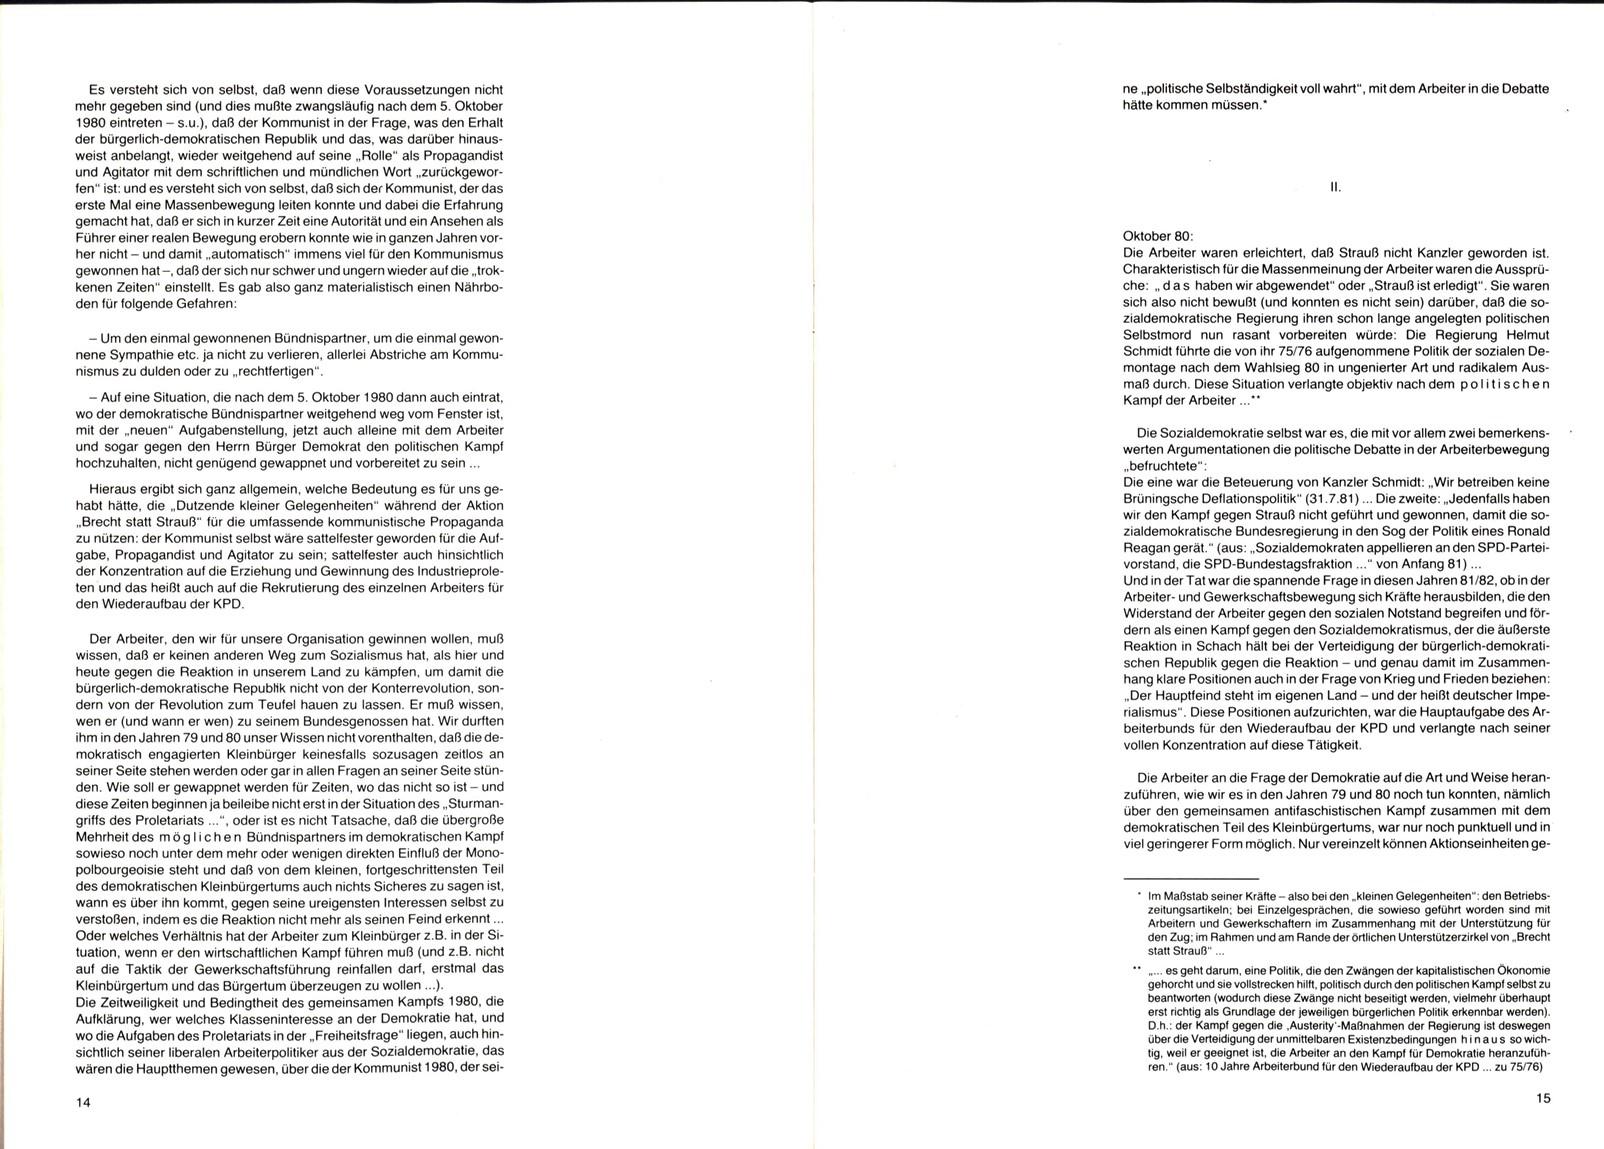 ABG_1985_Beschluesse_IV_Delegiertenkonferenz_09